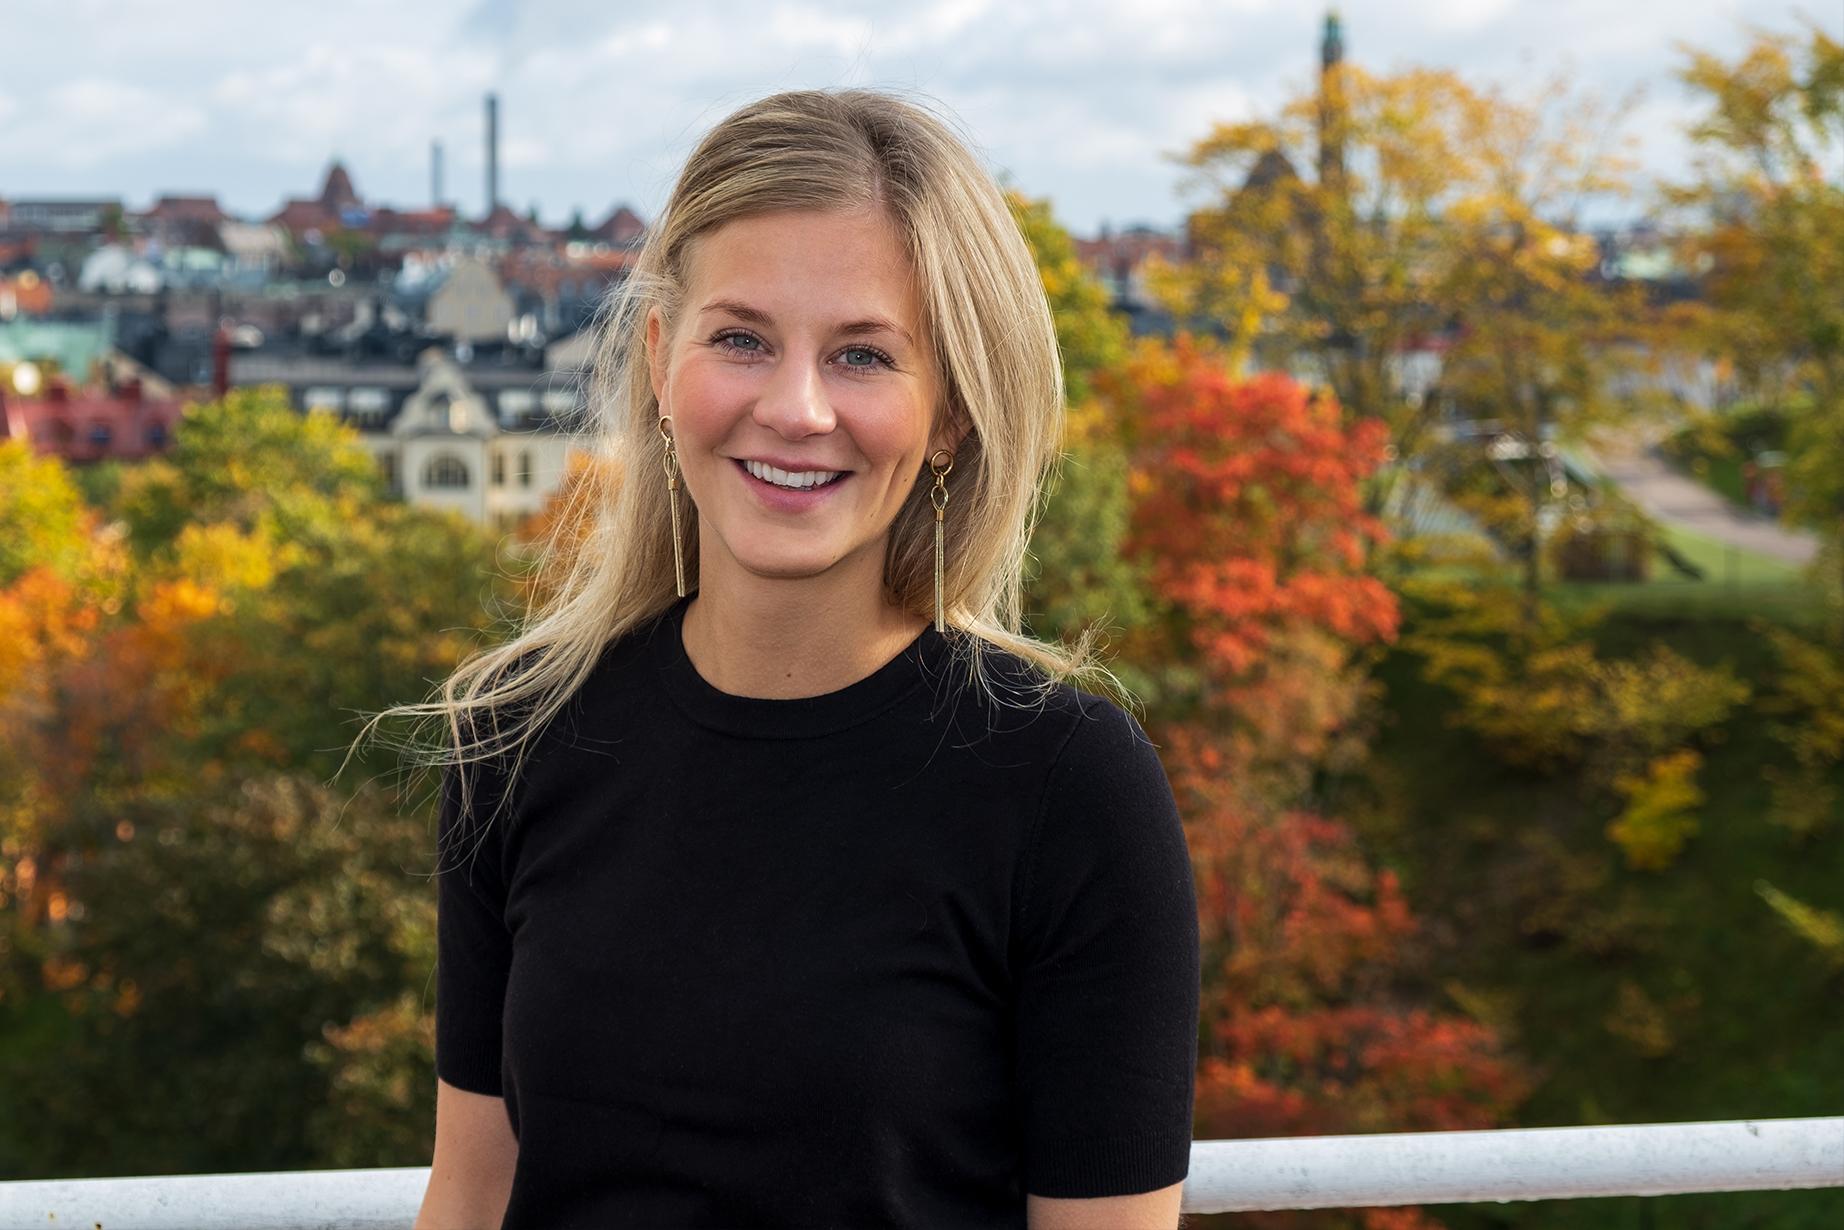 Trustly Careers - Employee testimonial in Stockholm